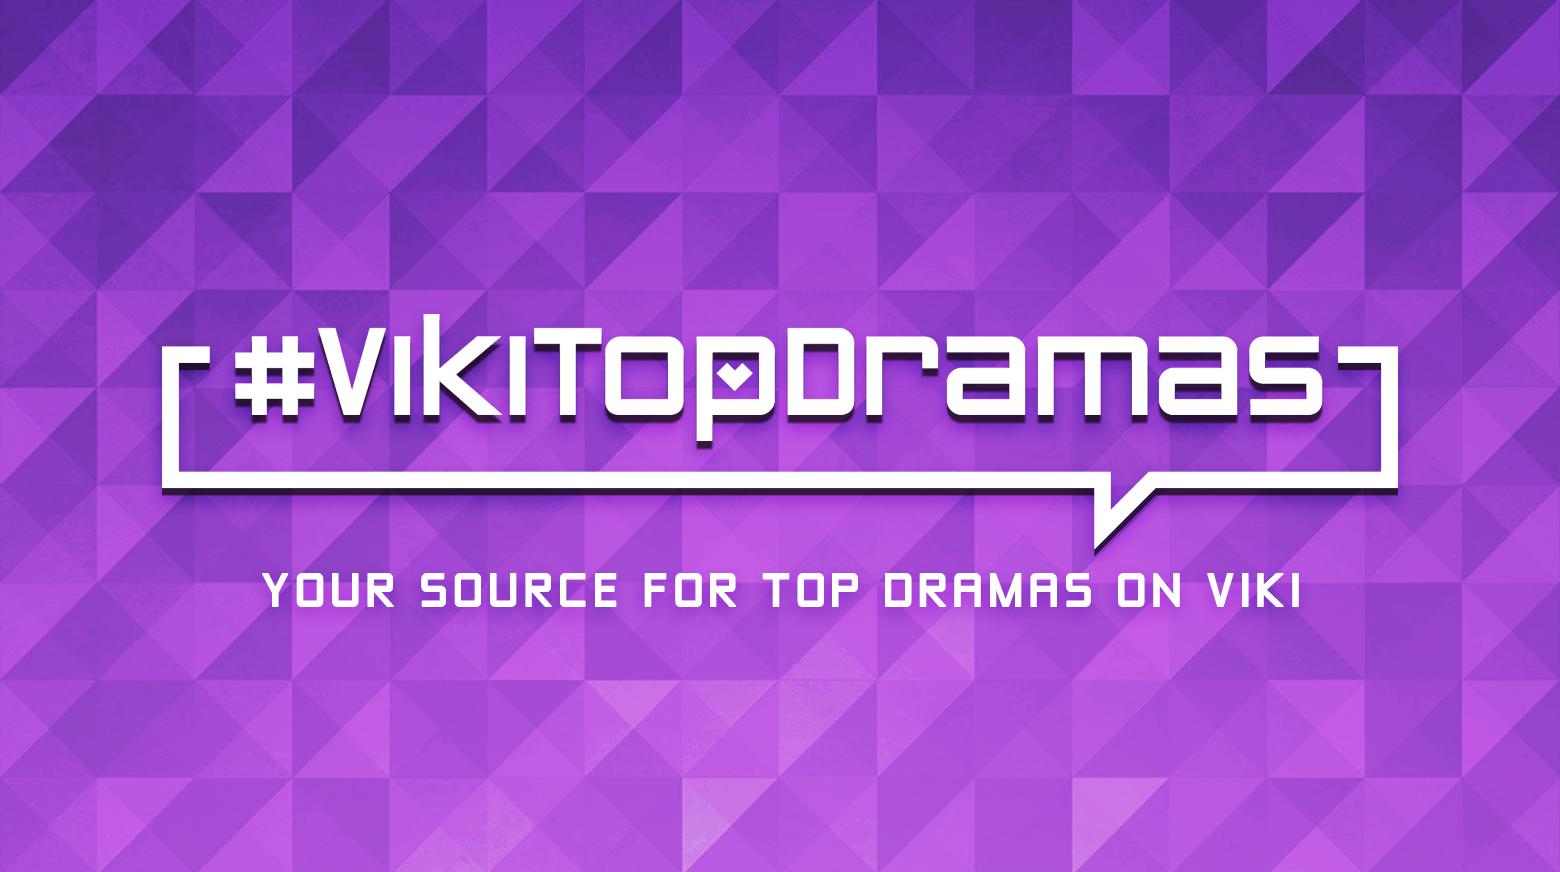 #VikiTopDramas